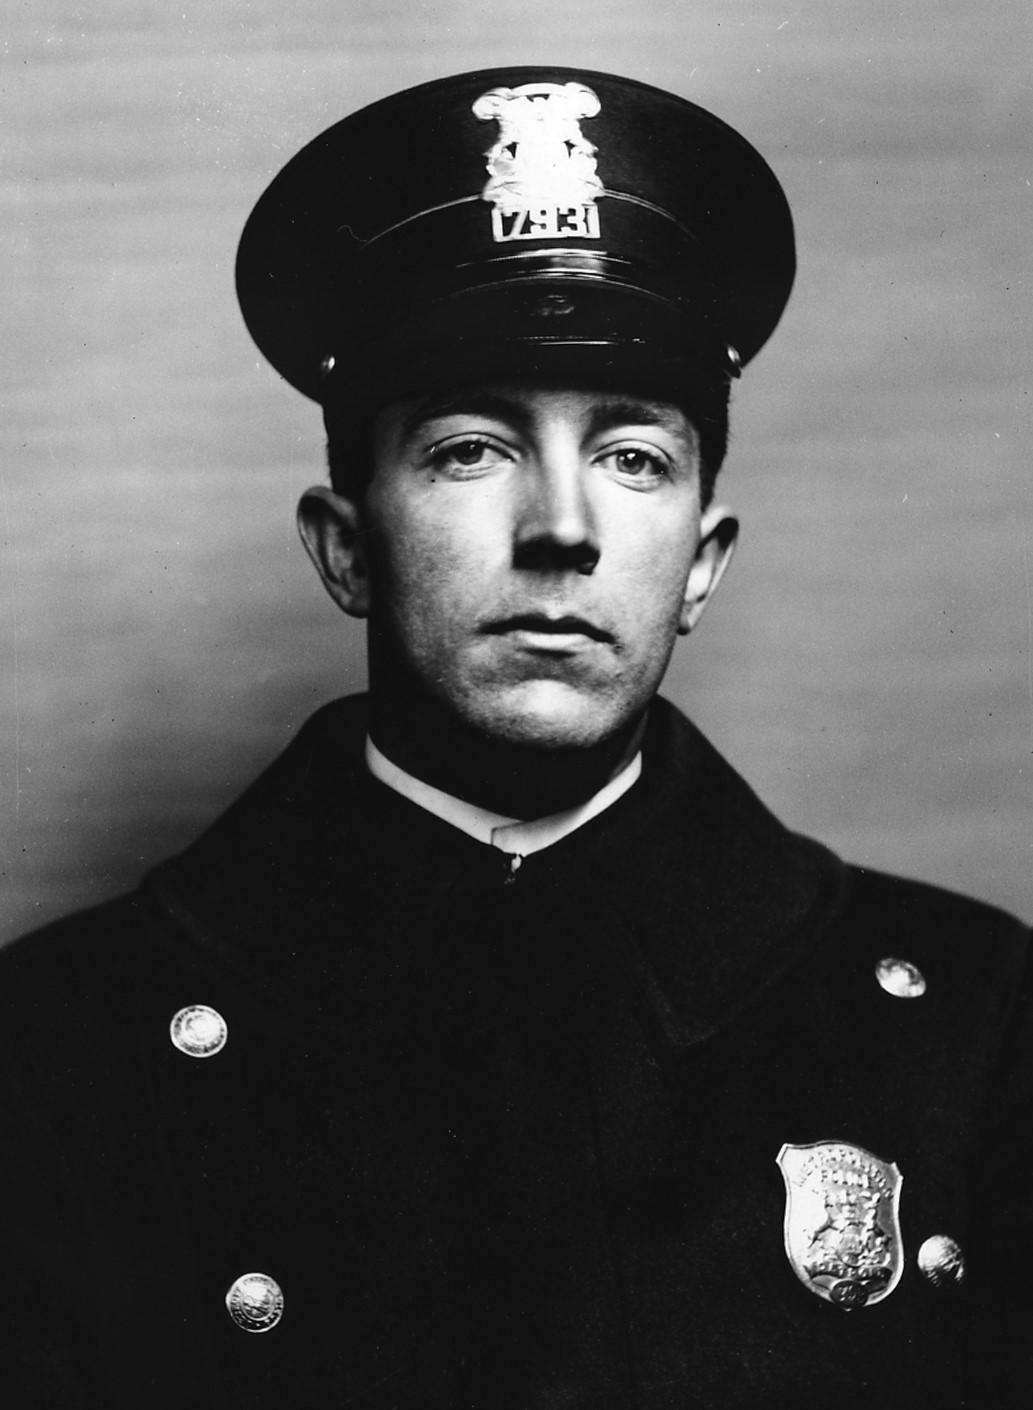 Deputy Sheriff James D. Mizner | Linn County Sheriff's Department, Missouri